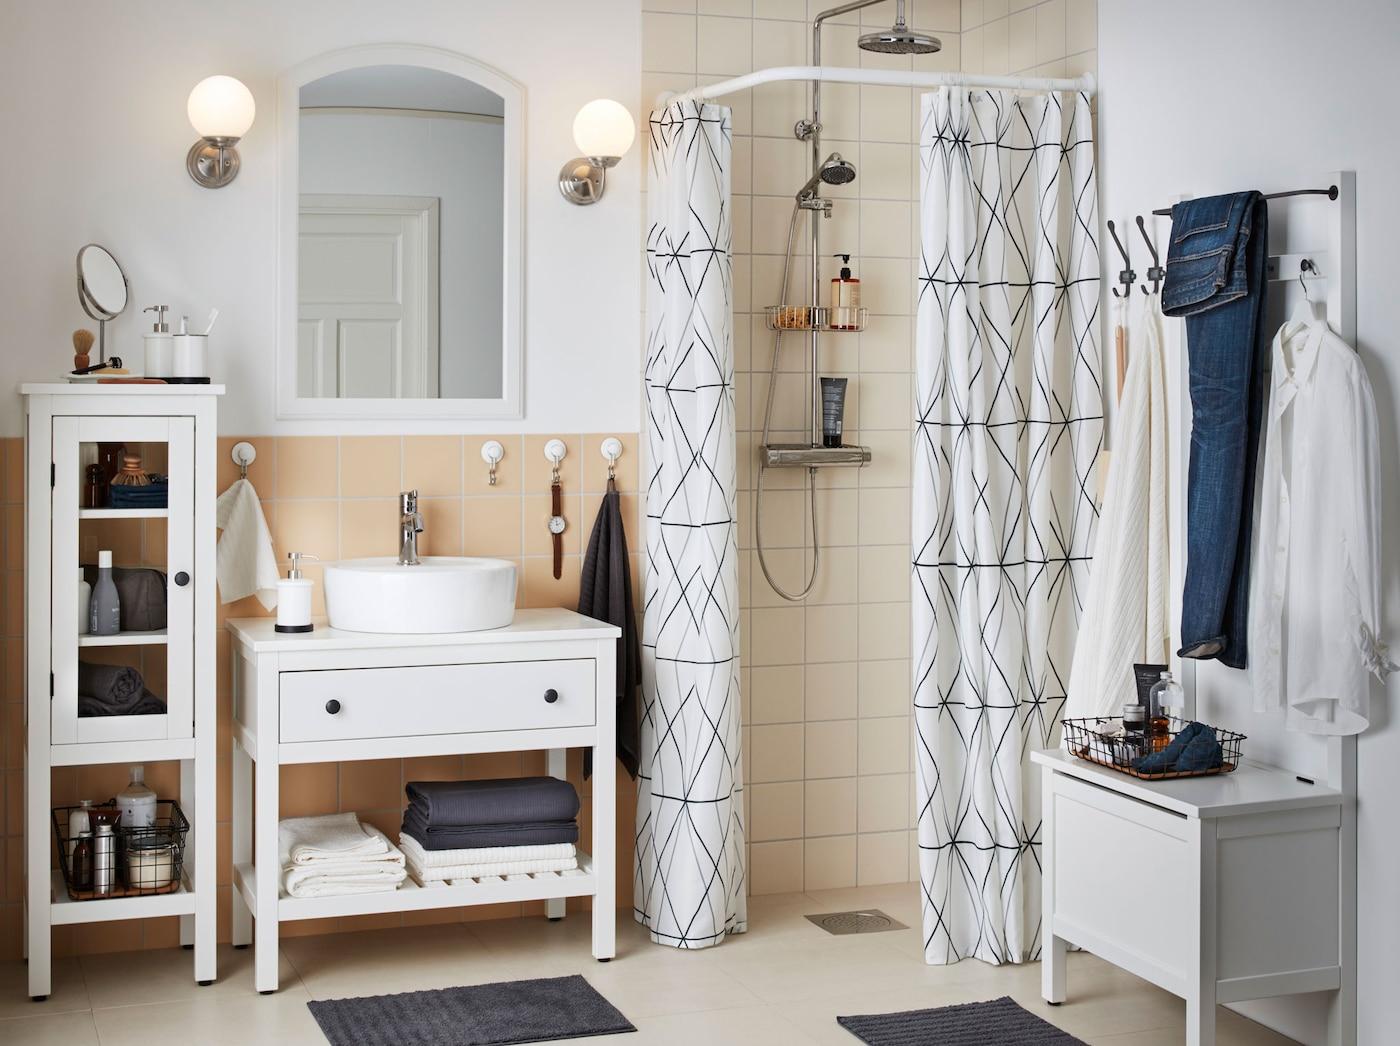 Ikea Storage Clutter A Freeclosed Bathroom 0kx8nowp LzVpMGqSUj